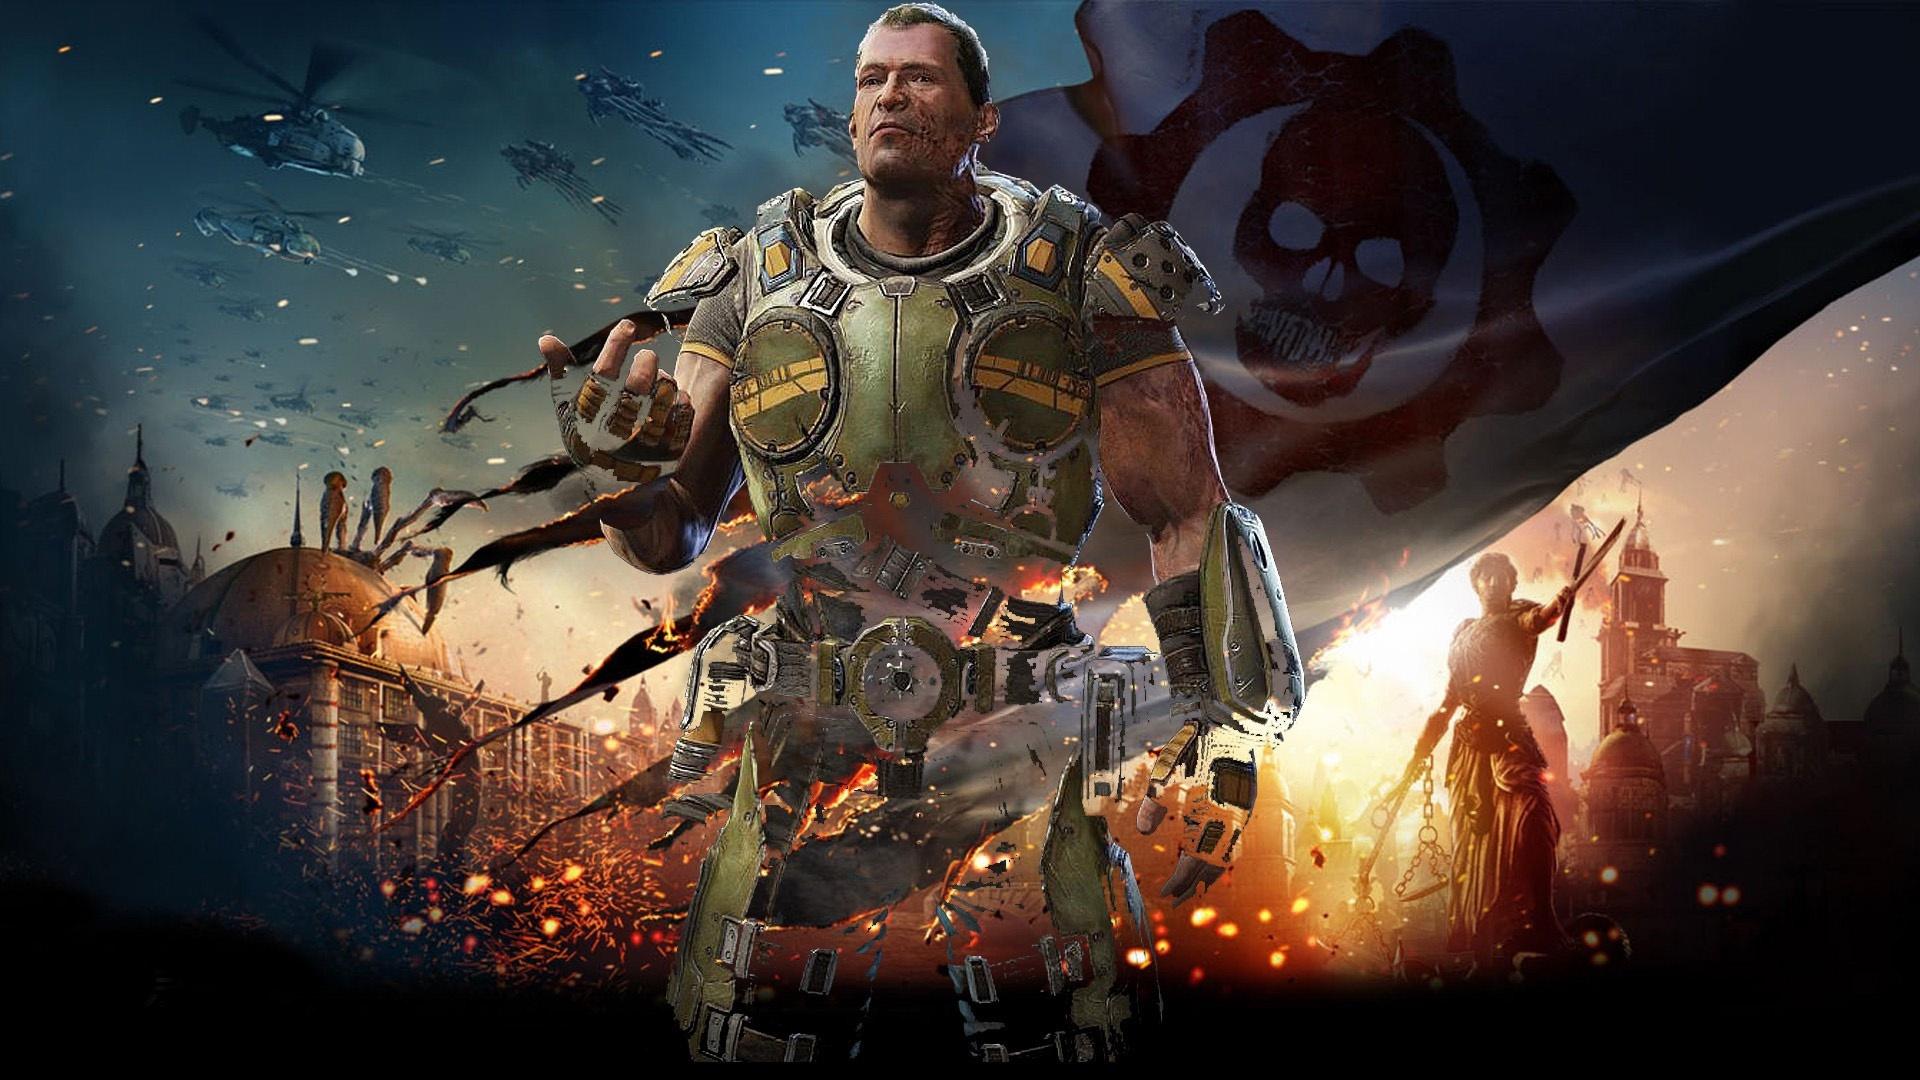 Gears Of War free background